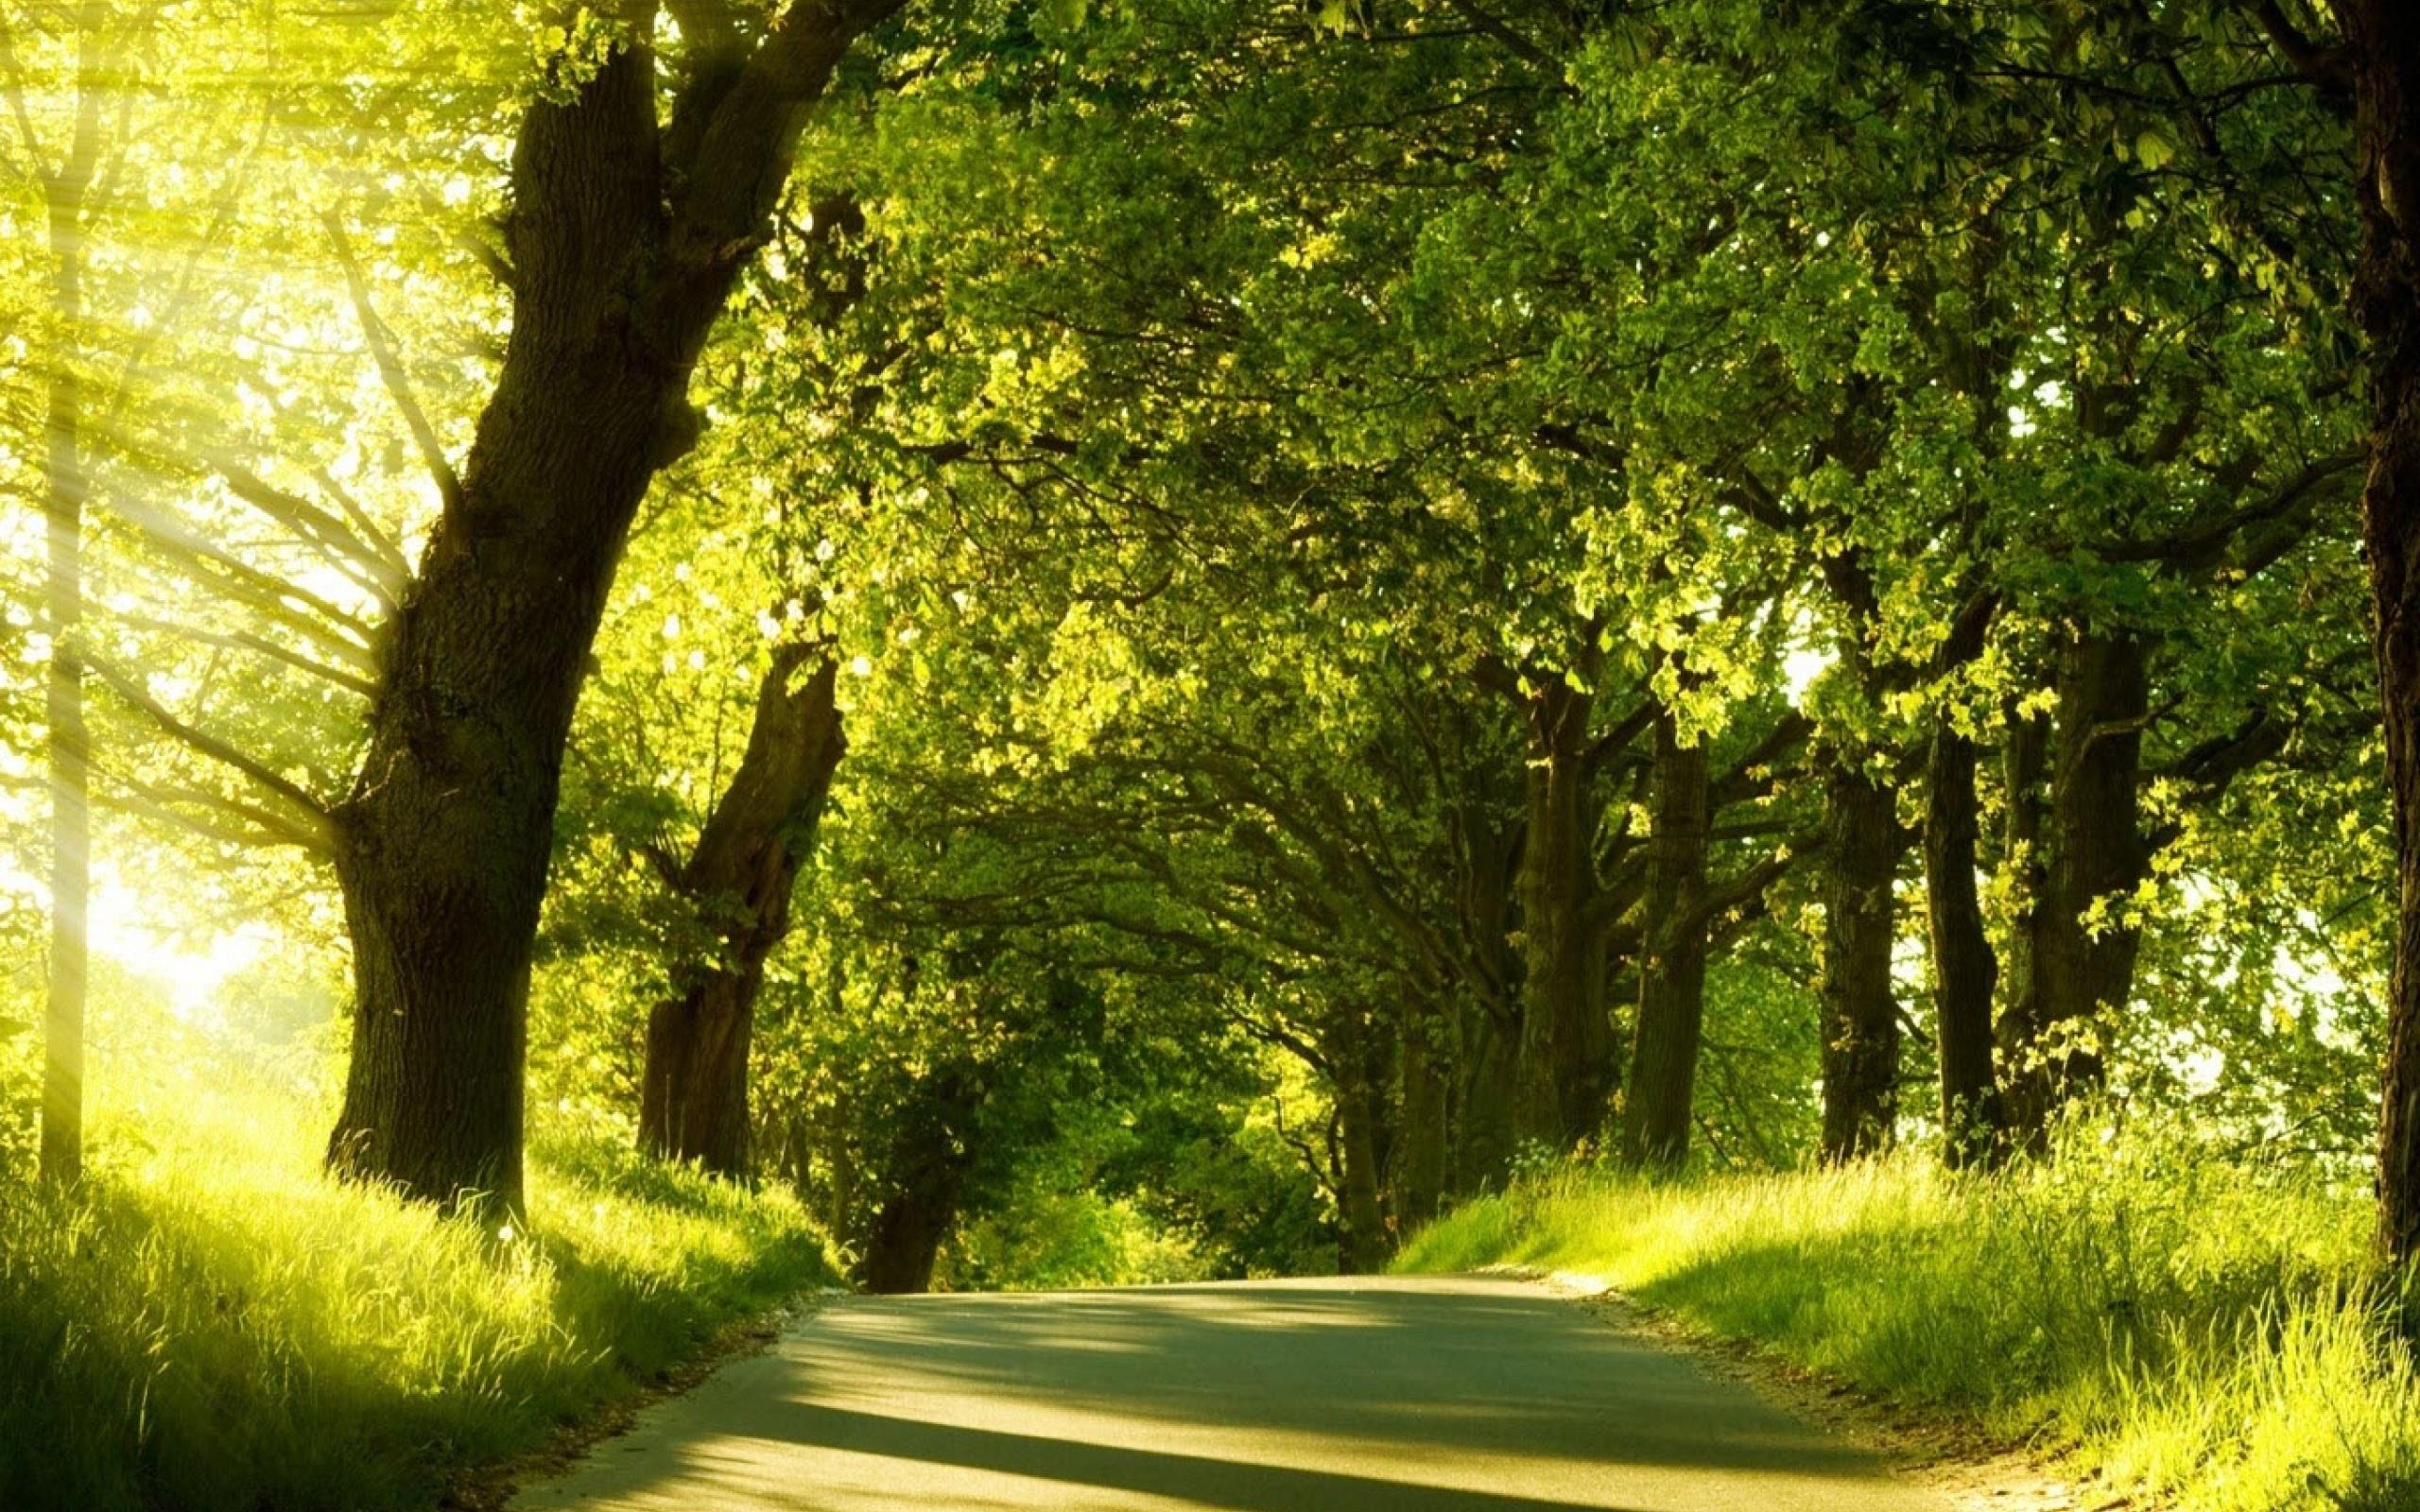 Natural Scenery 32